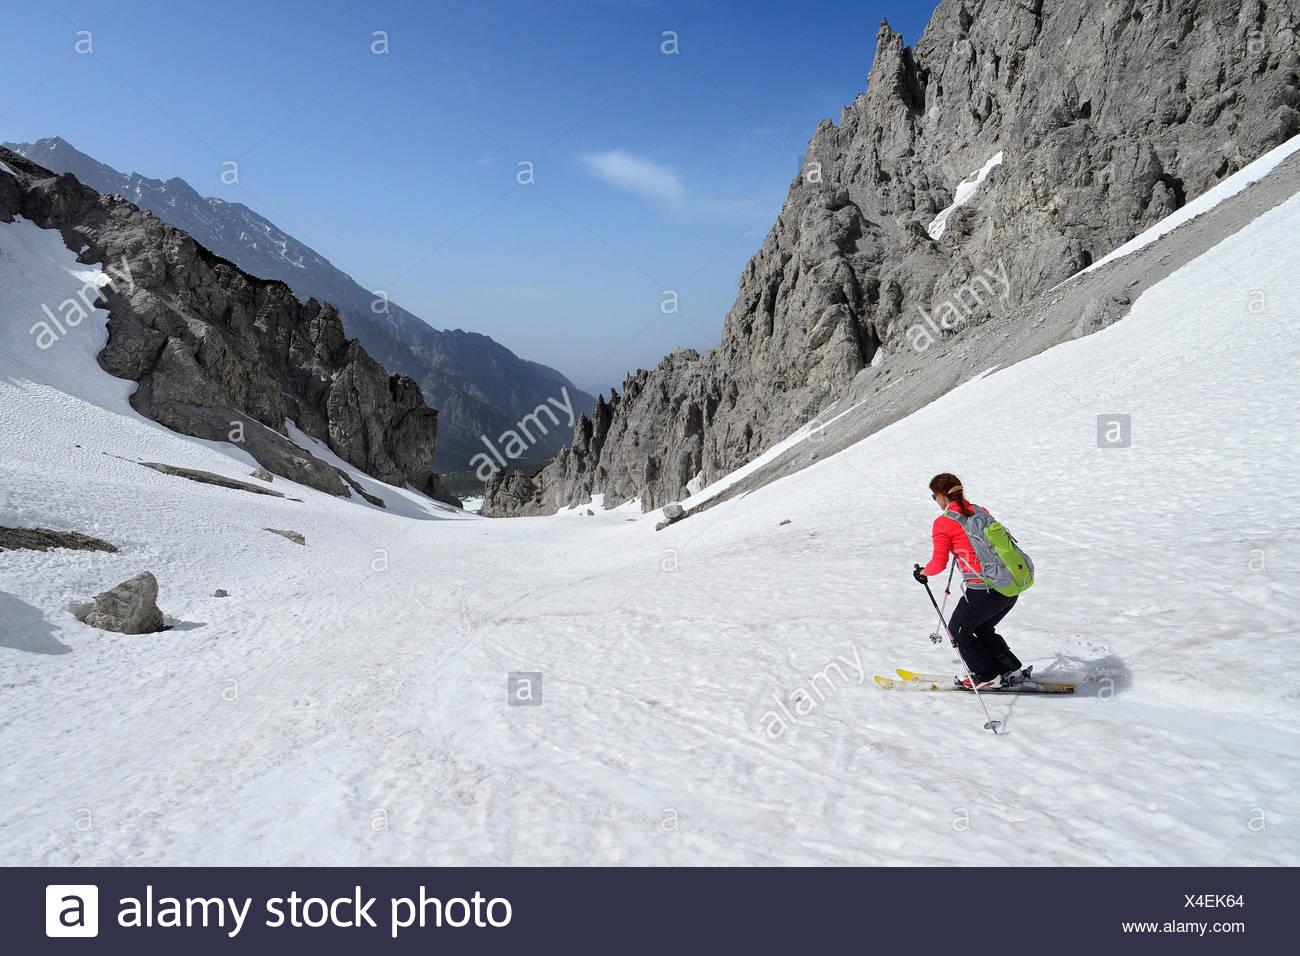 Female backcountry skier downhill skiing through Loferer Seilergraben, Berchtesgaden Alps, Berchtesgaden National Park, Upper Ba - Stock Image